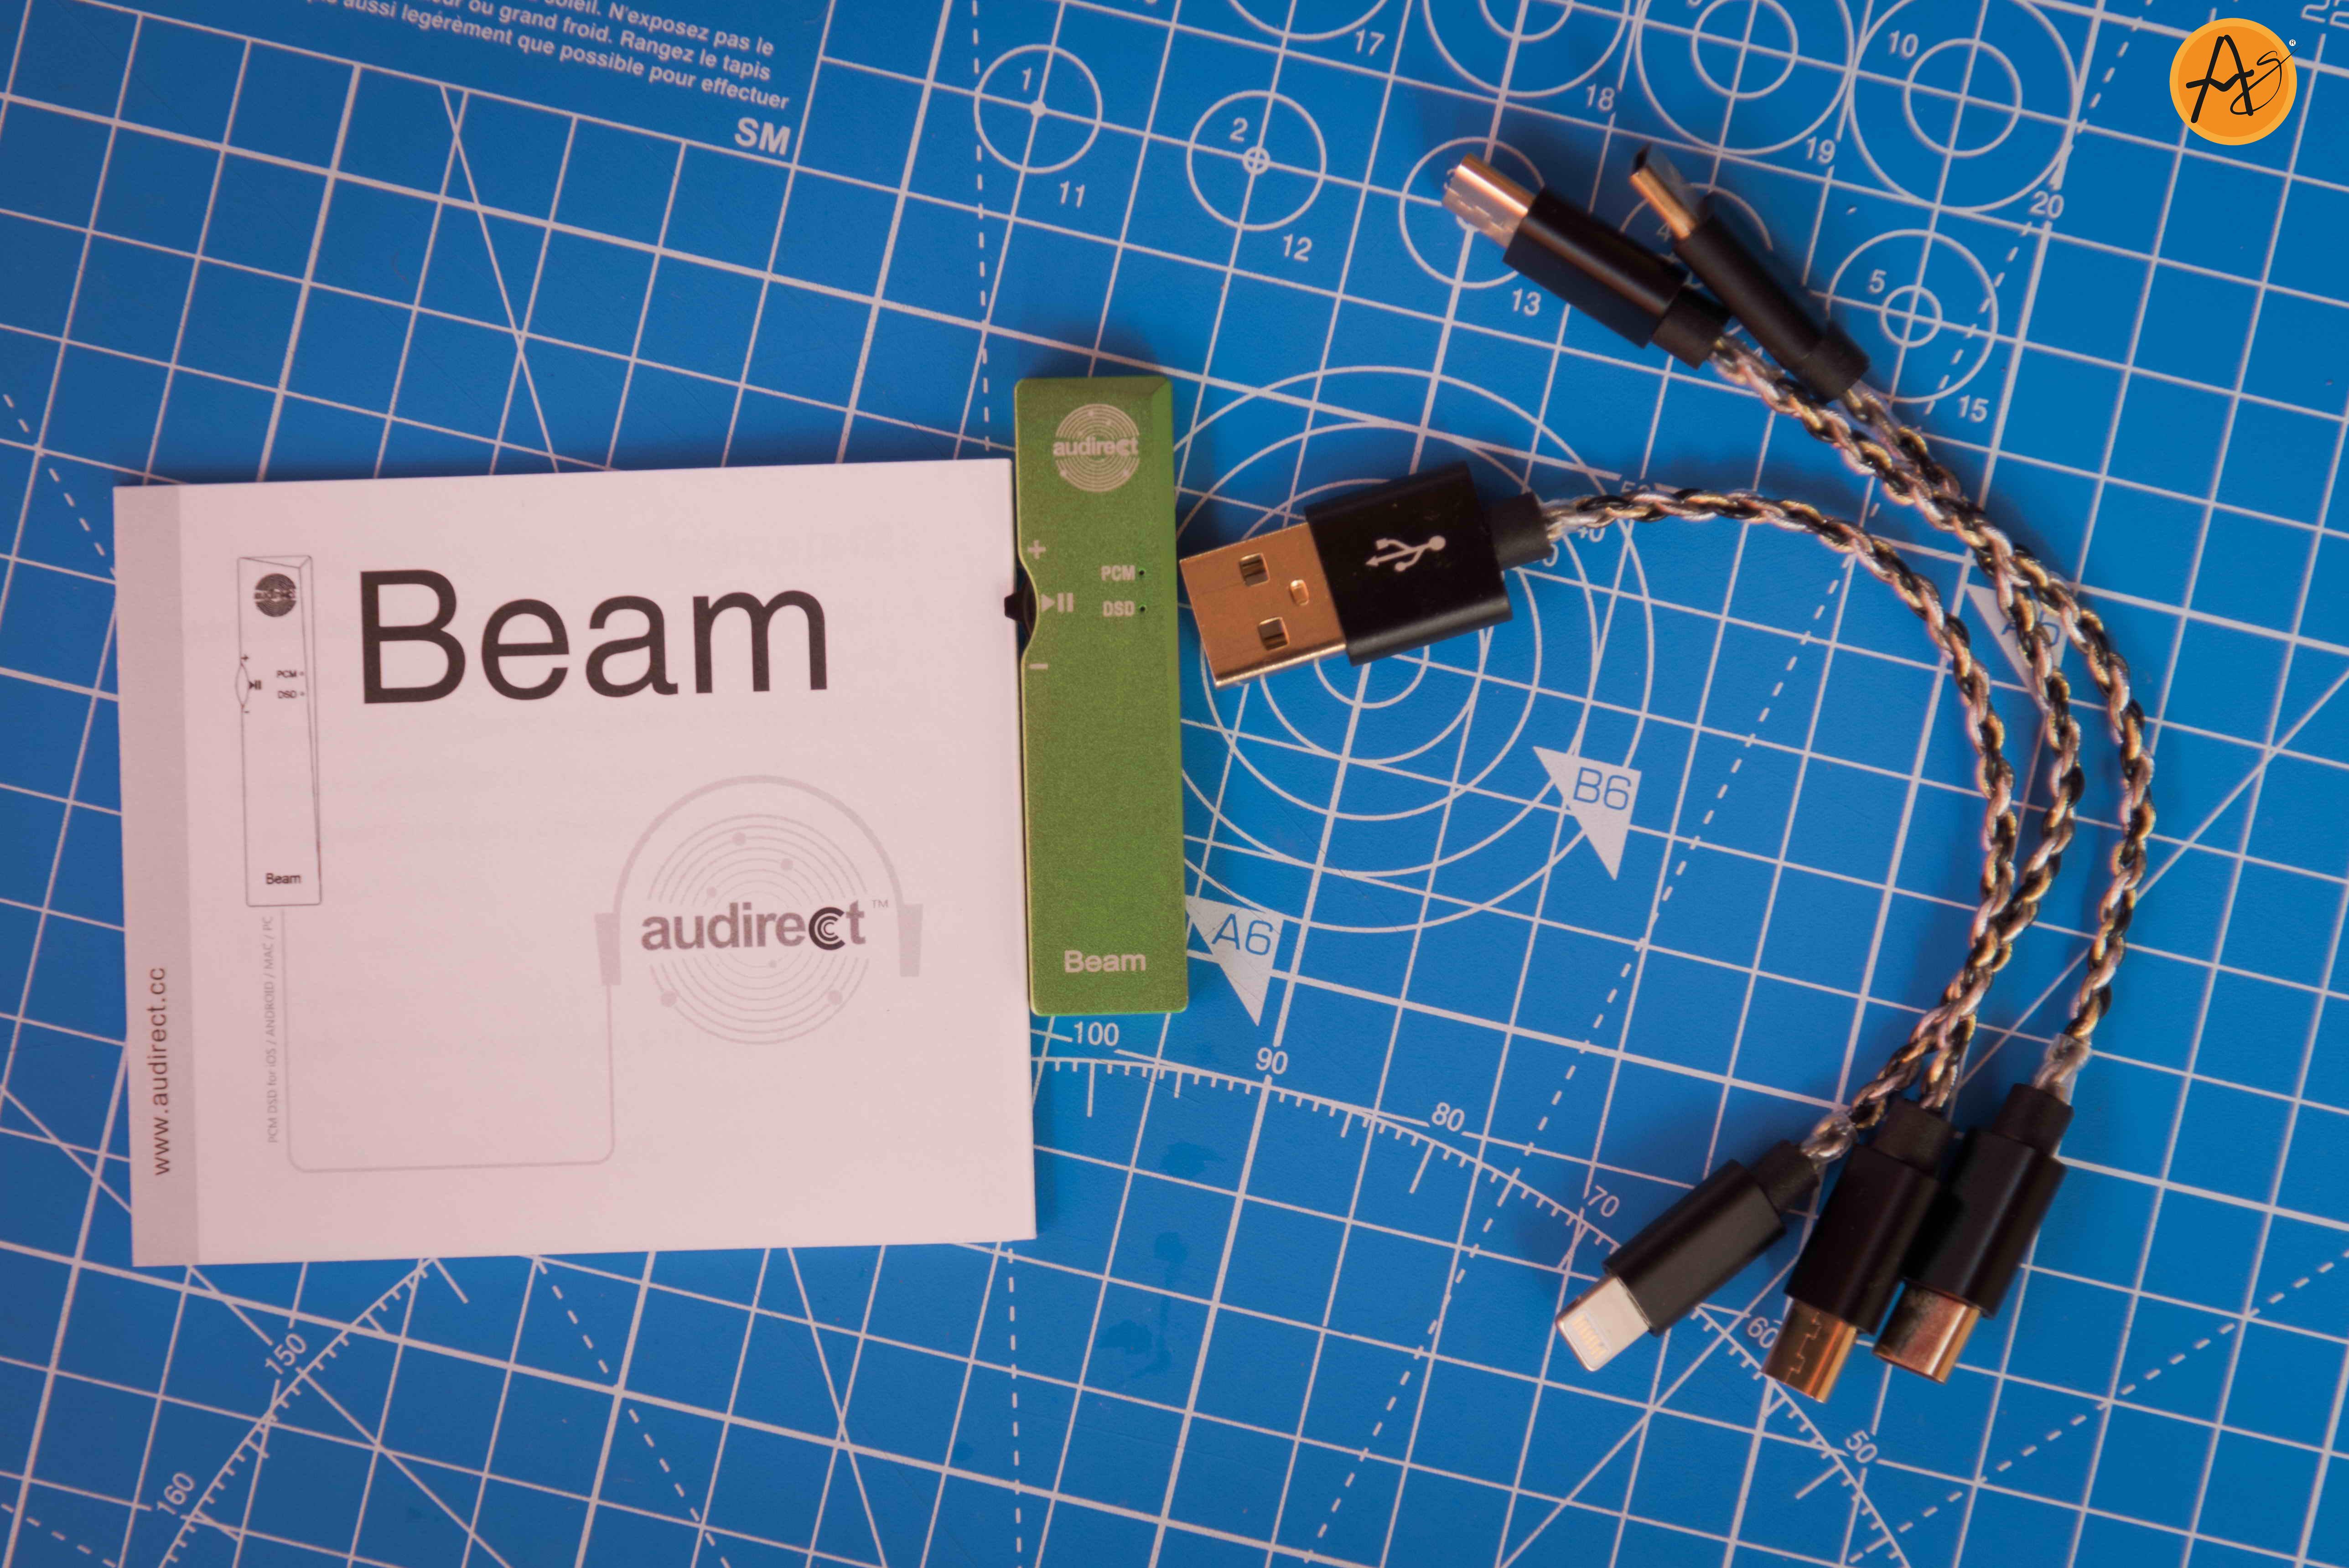 Audirect Beam